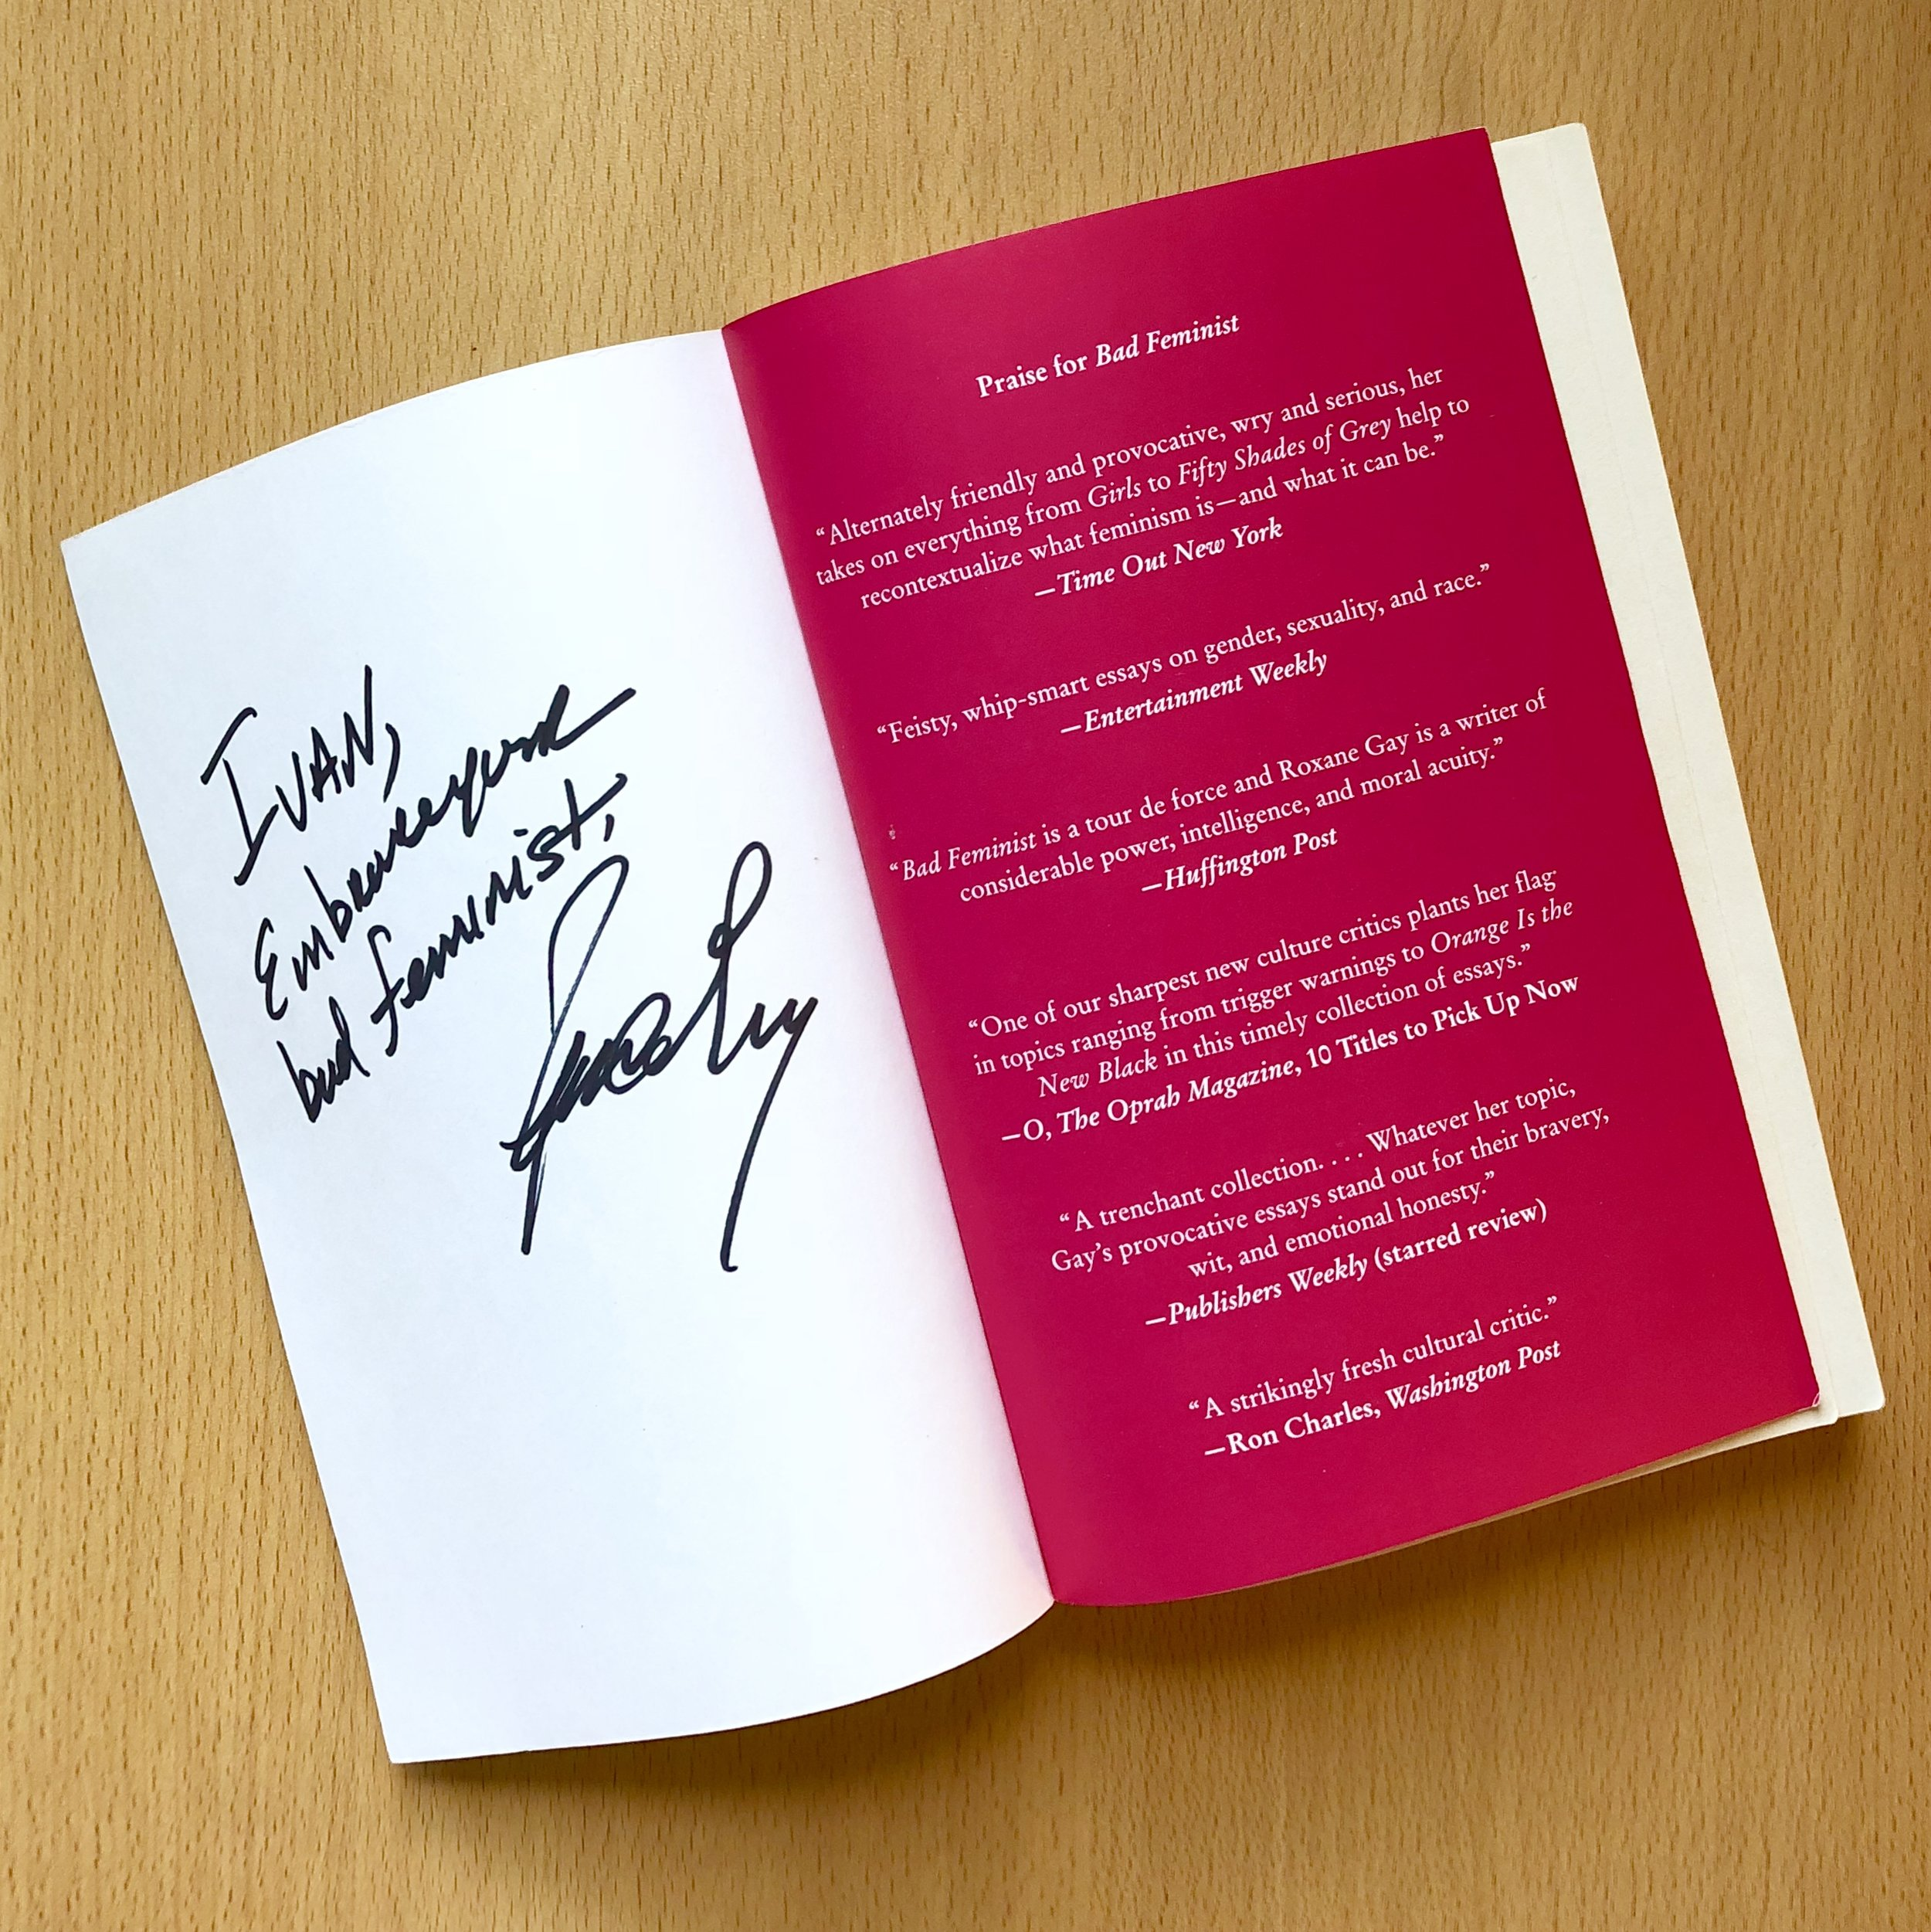 Roxane Gay's autograph